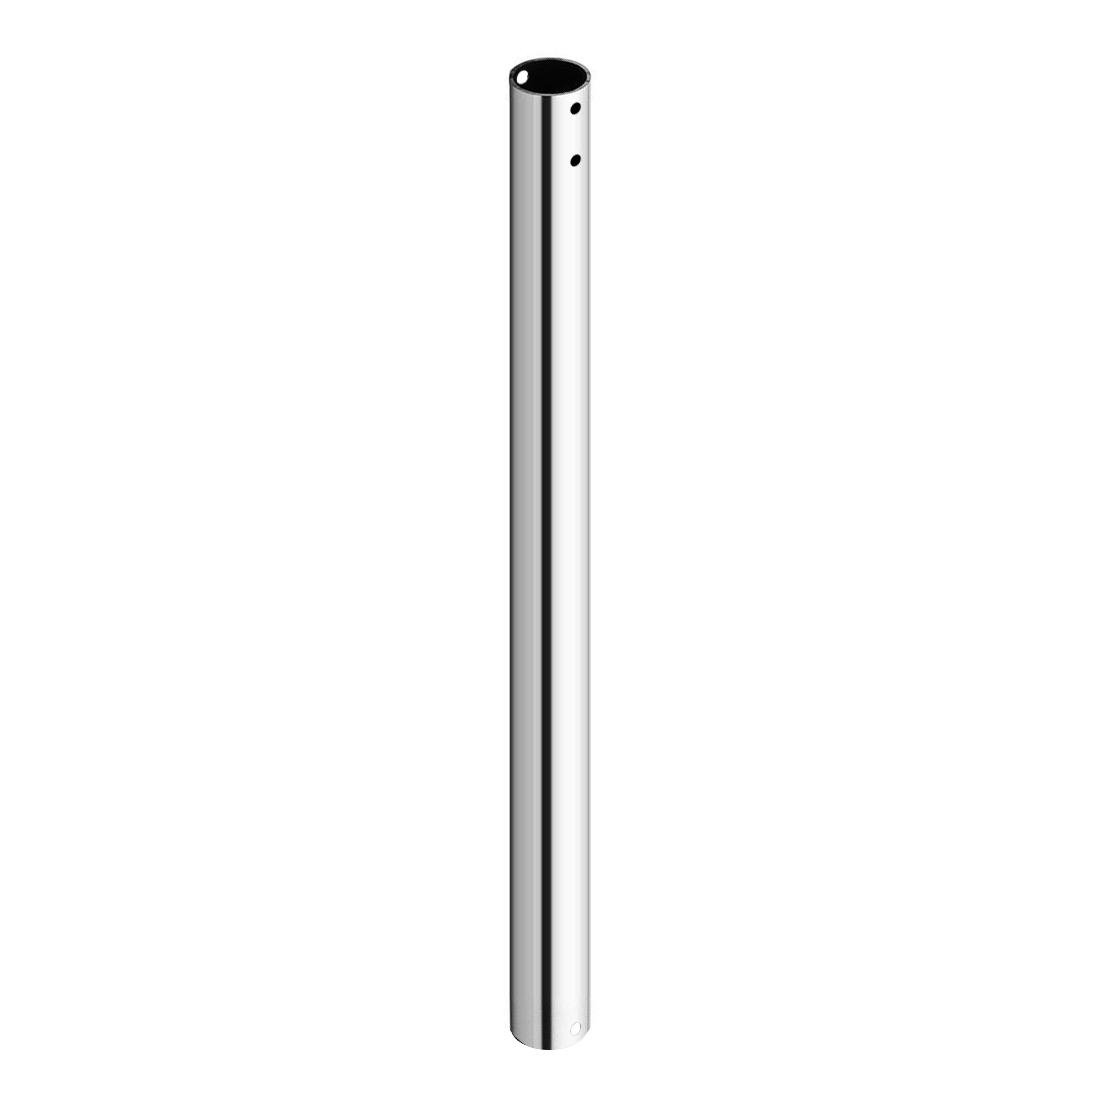 Peerless-AV MOD-P150 - Штанга диаметром 50,8 мм, длина 1500 мм